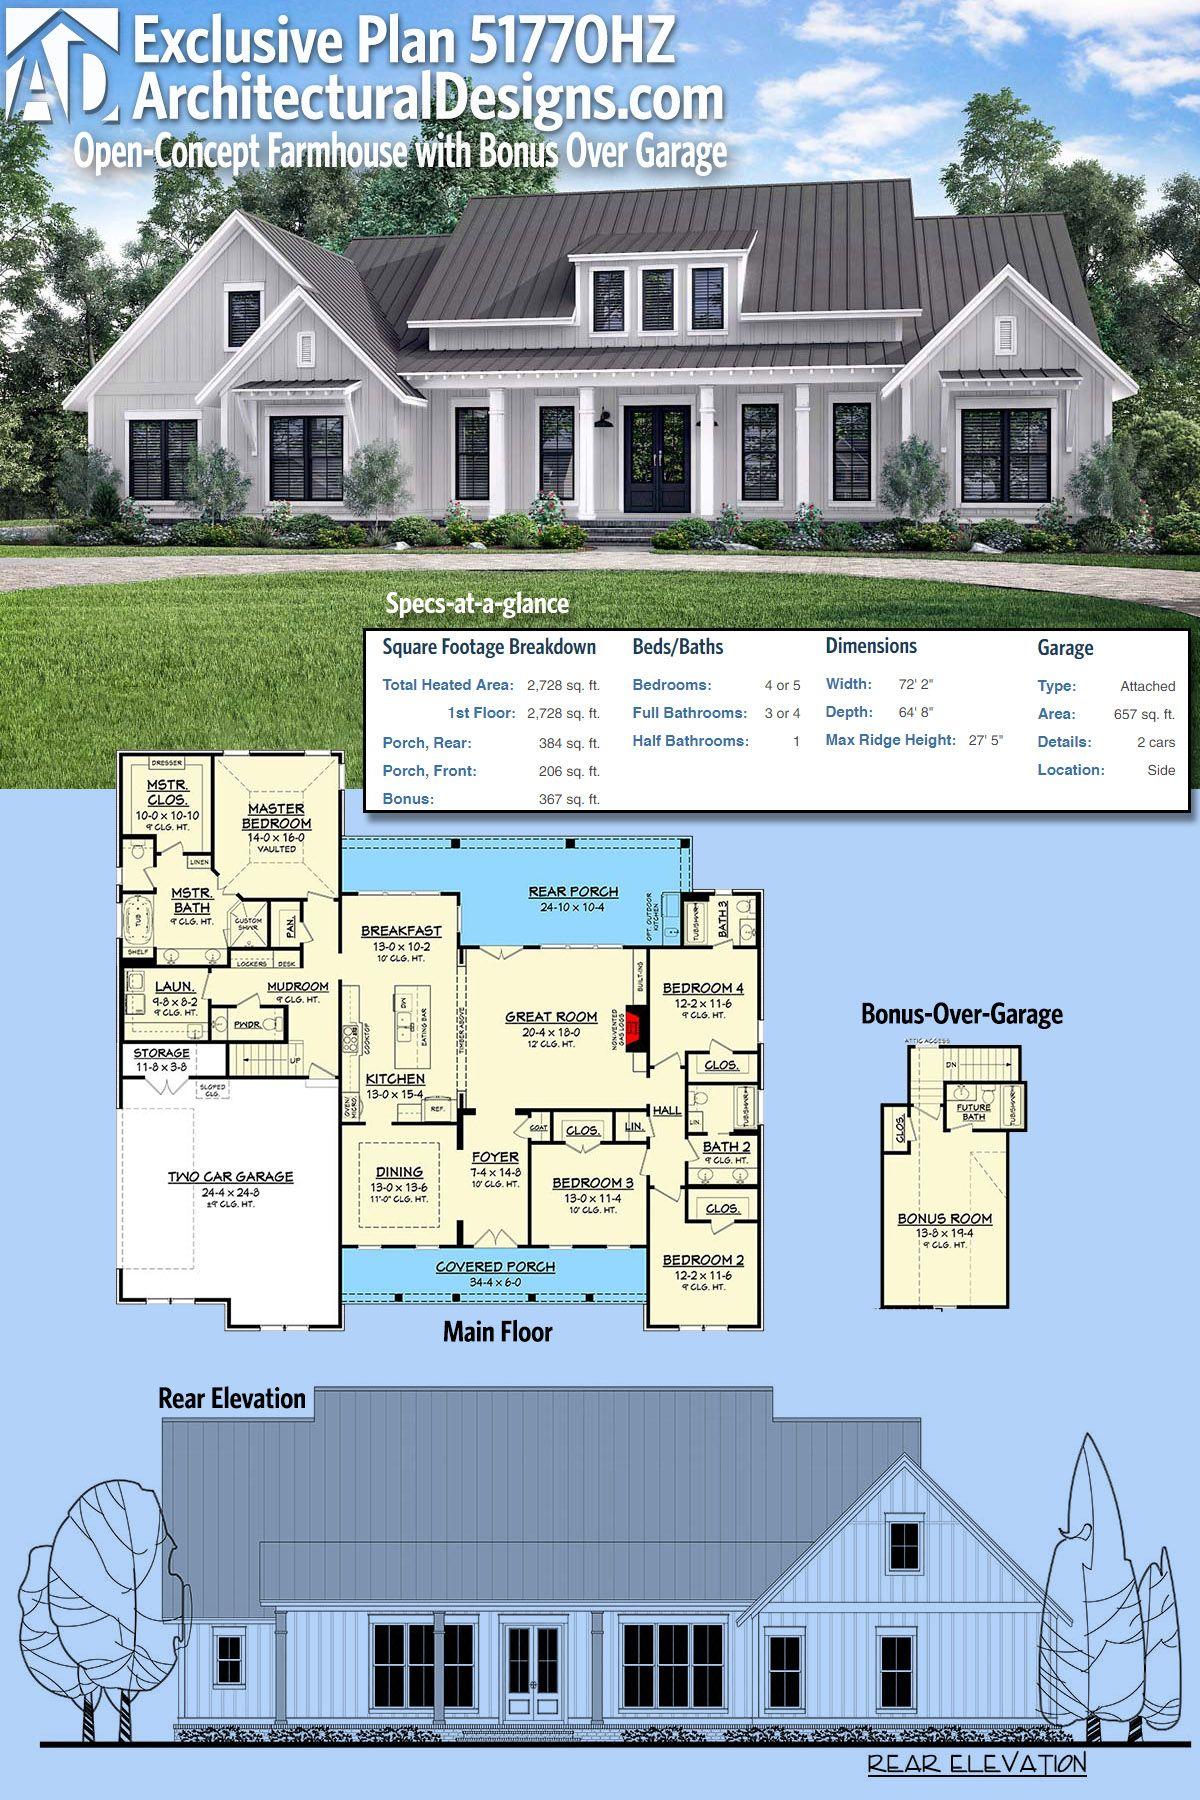 Architectural Designs Exclusive Open Concept Farmhouse with Bonus